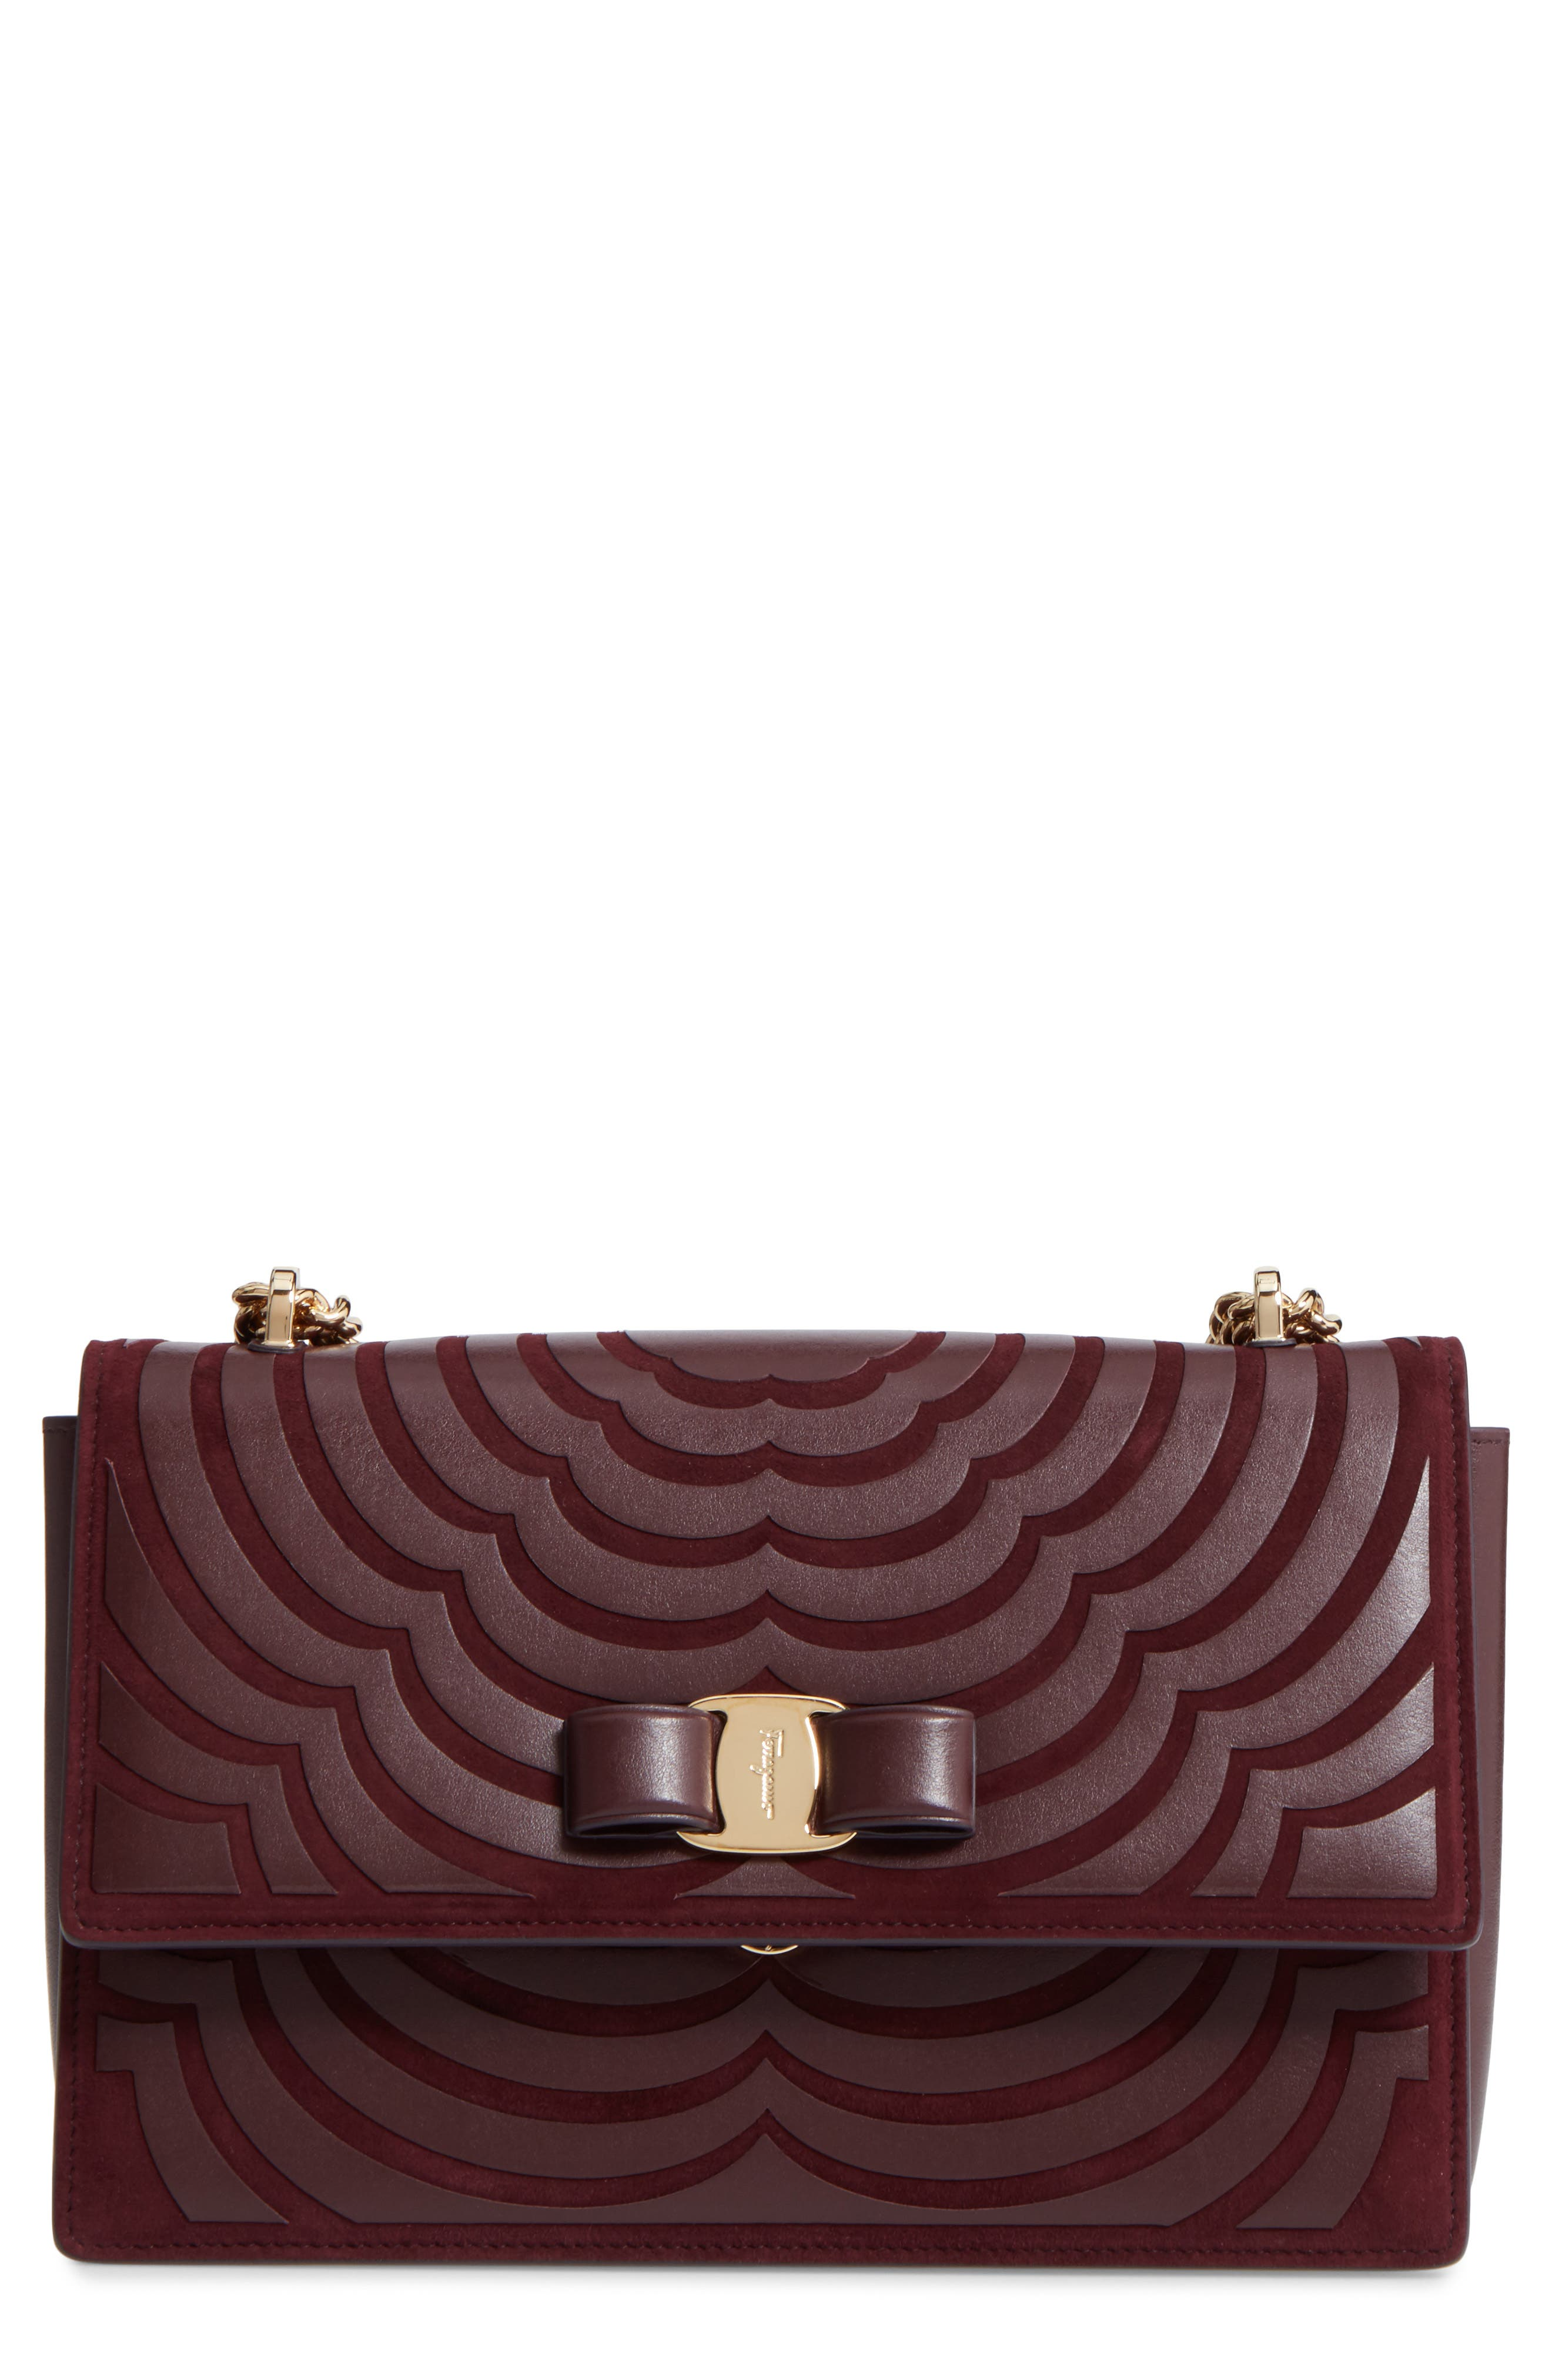 Salvatore Ferragamo Medium Ginny Floral Leather Shoulder Bag